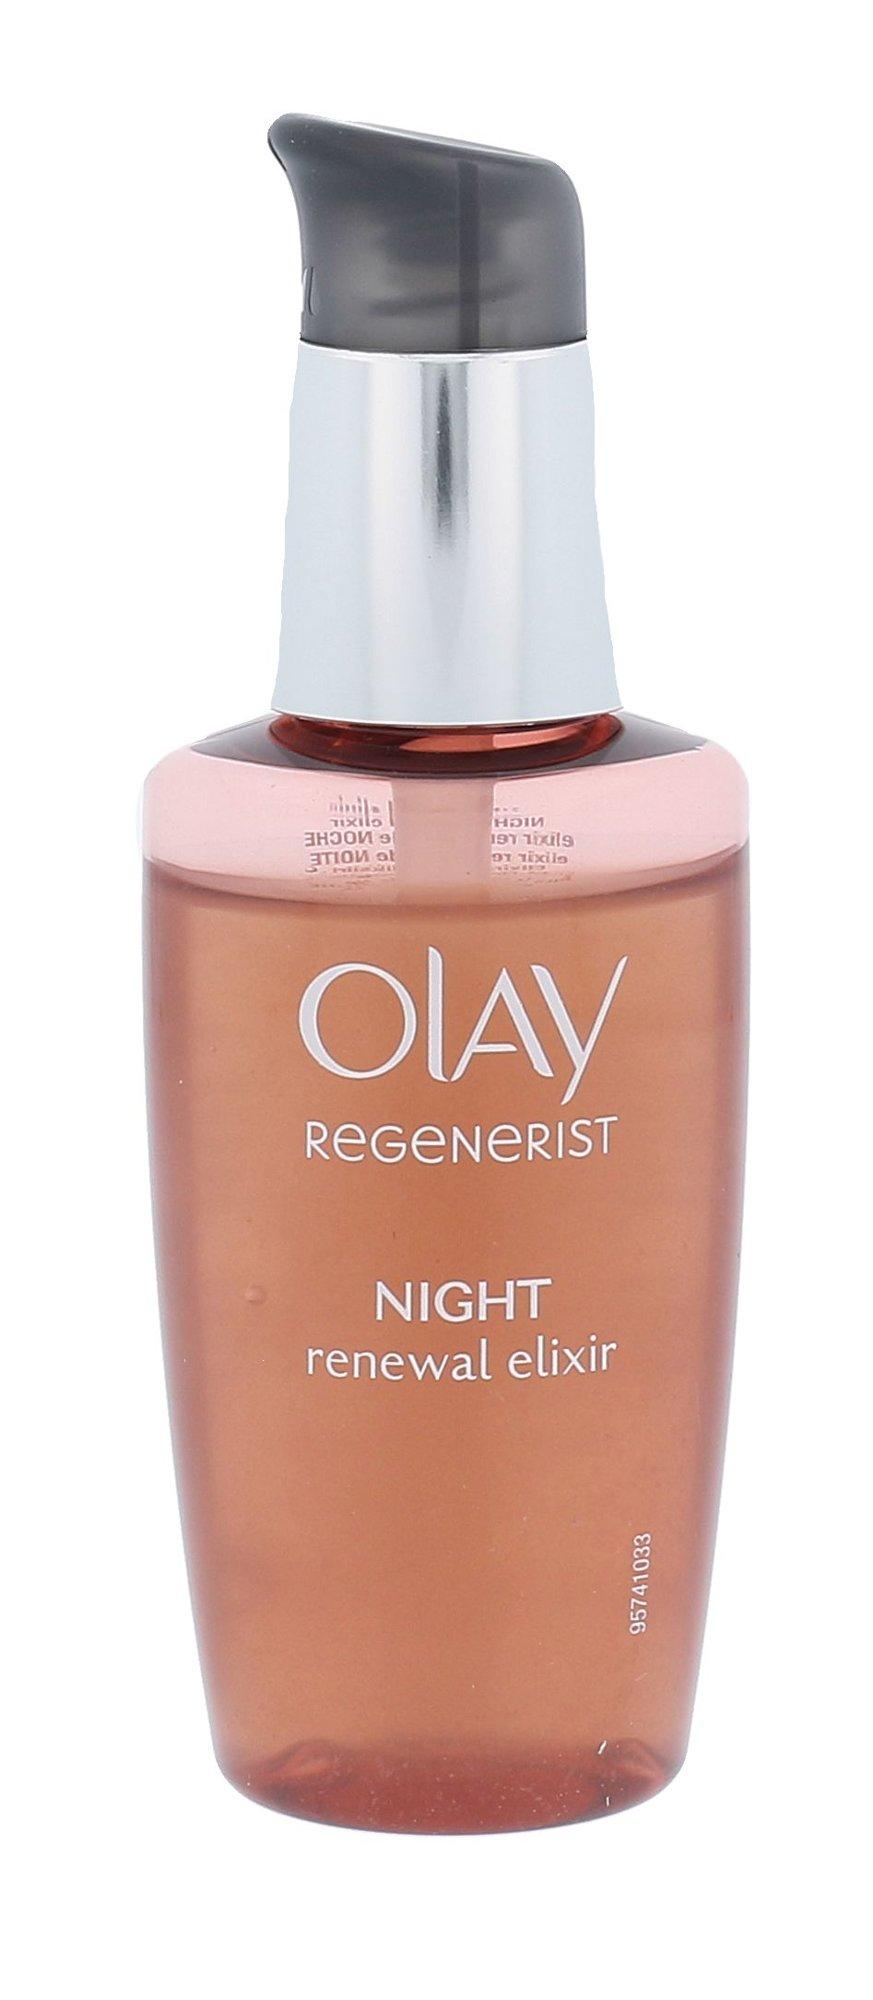 Olay Regenerist Night Renewal Elixir Cosmetic 50ml